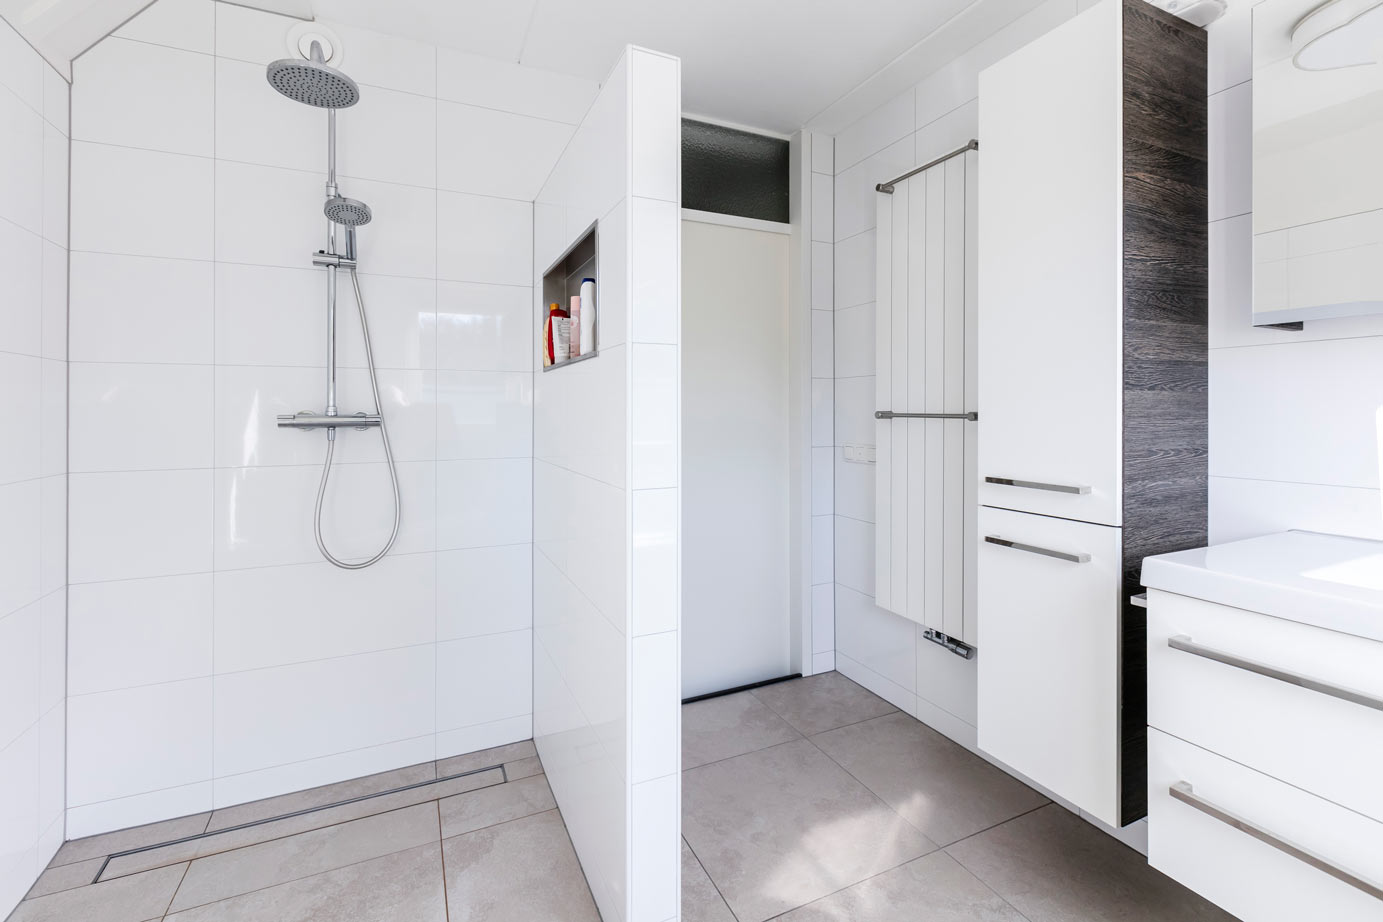 Tegels Badkamer Lelystad : Badkamer kopen in lelystad hoge klantscore lees ervaringen